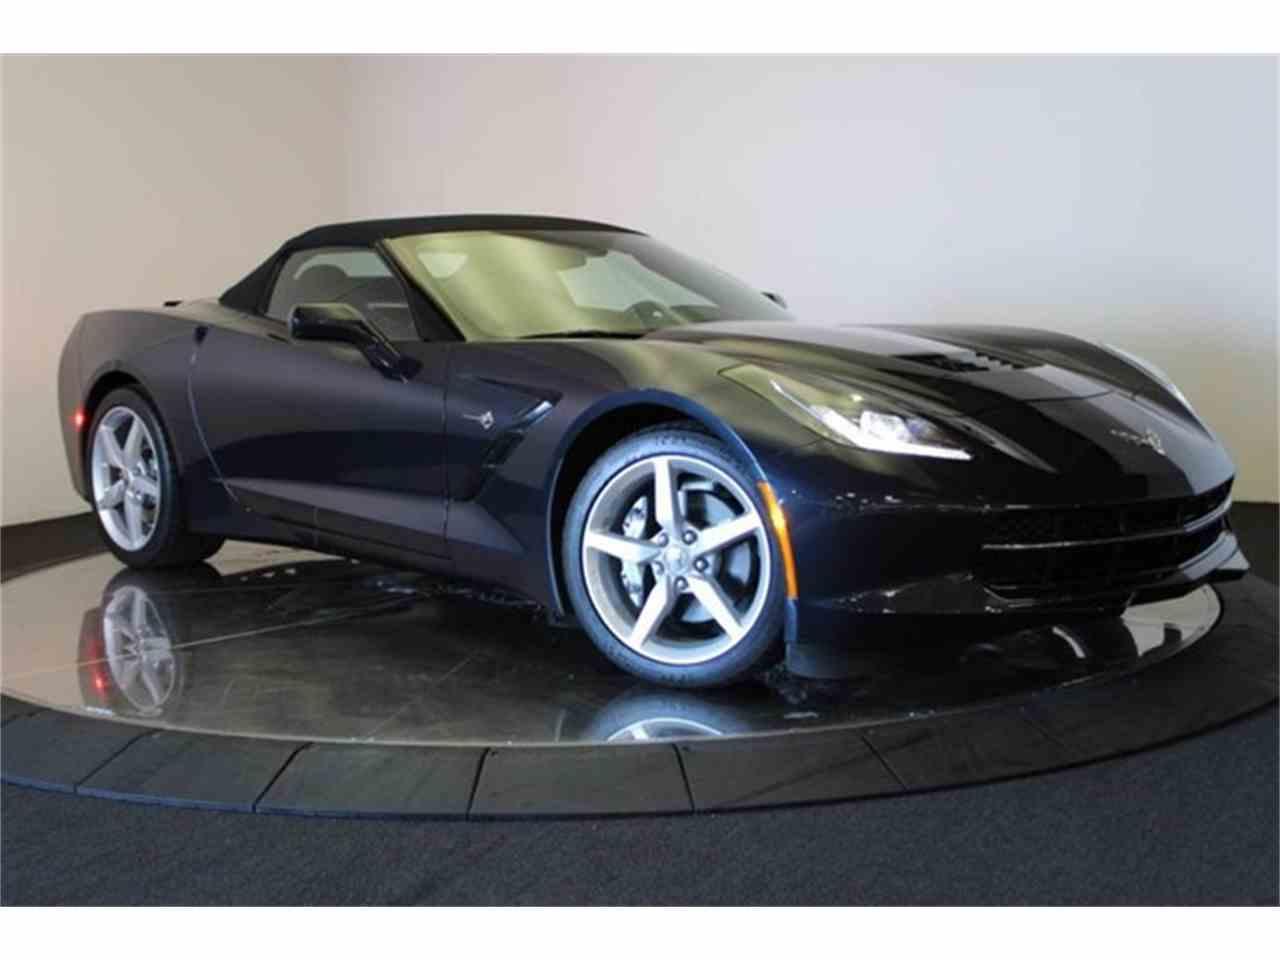 2014 Chevrolet Corvette for Sale - CC-1035638